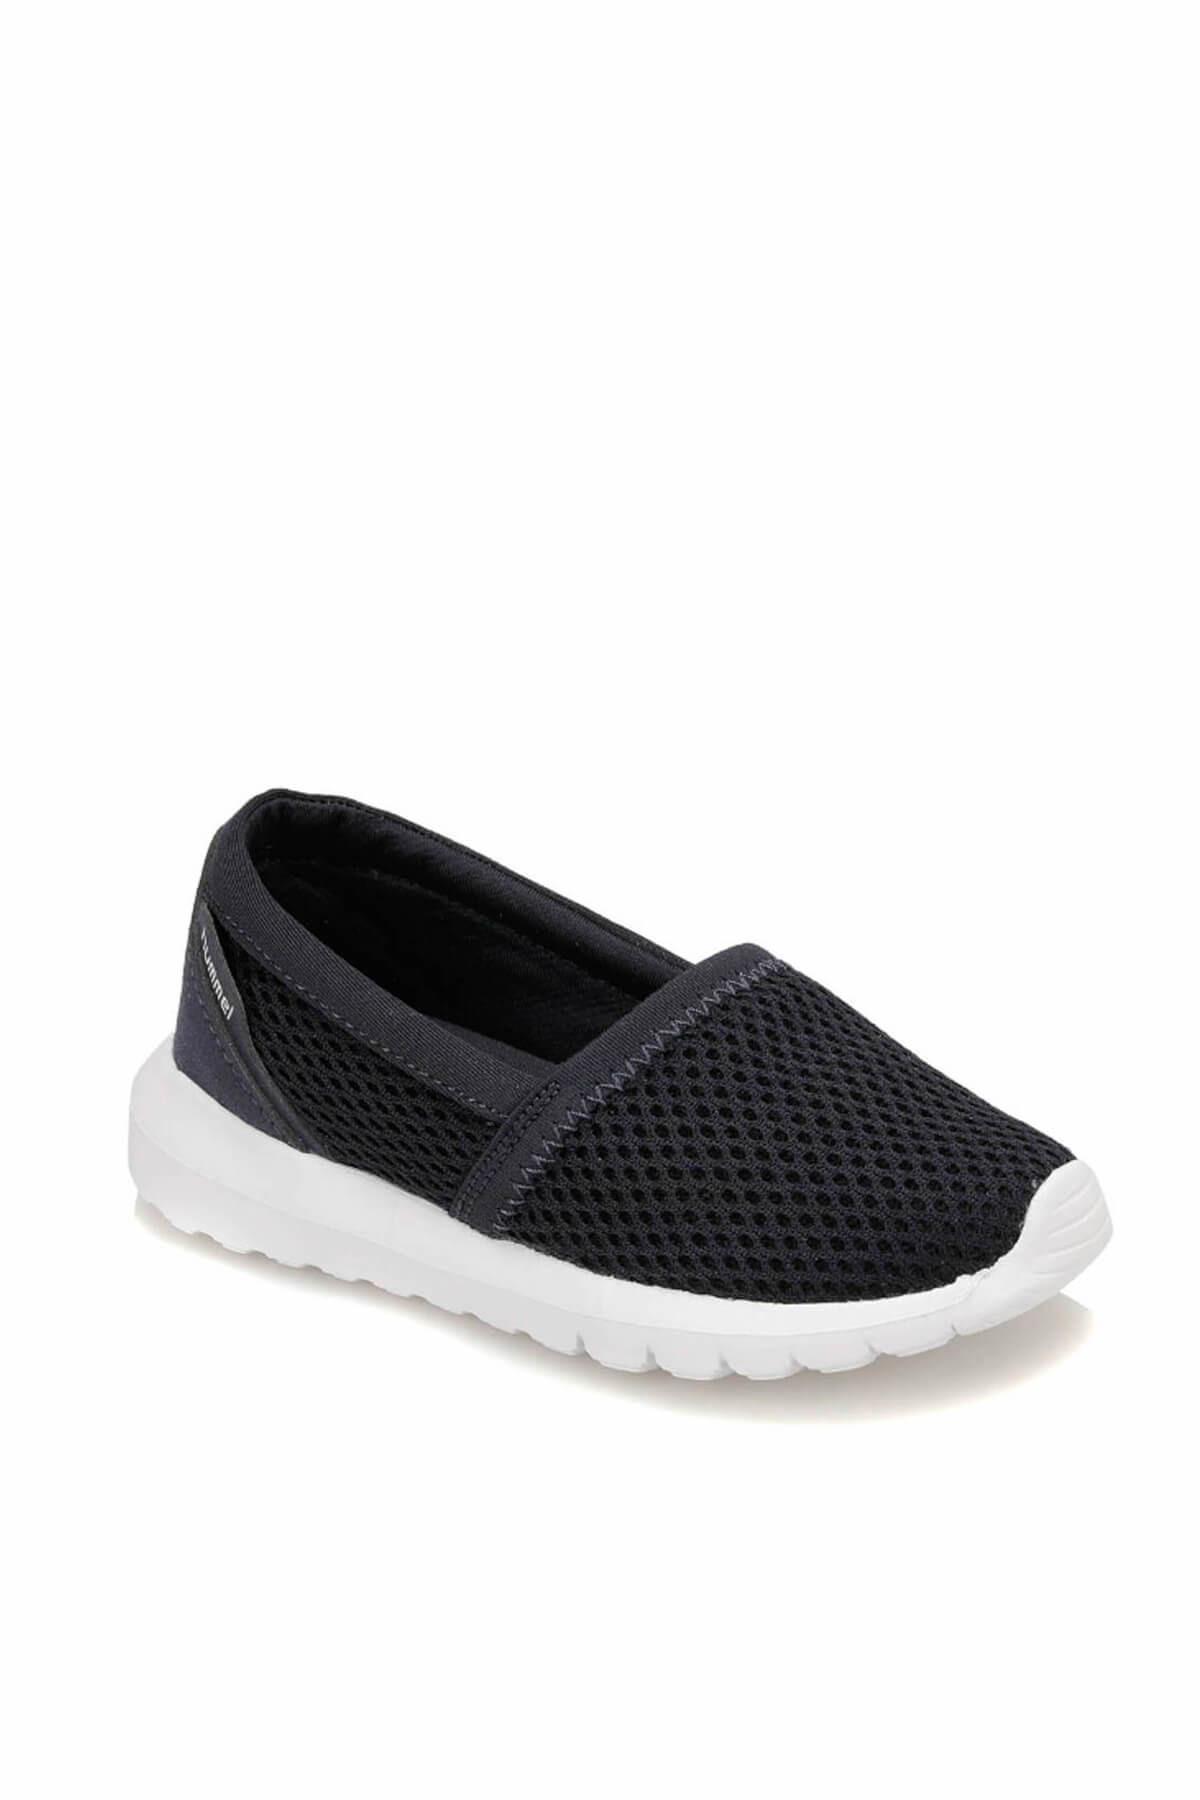 HUMMEL KIDS Hummel 201228-7459 Lacivert Kız Çocuk Sneaker 100321274 2